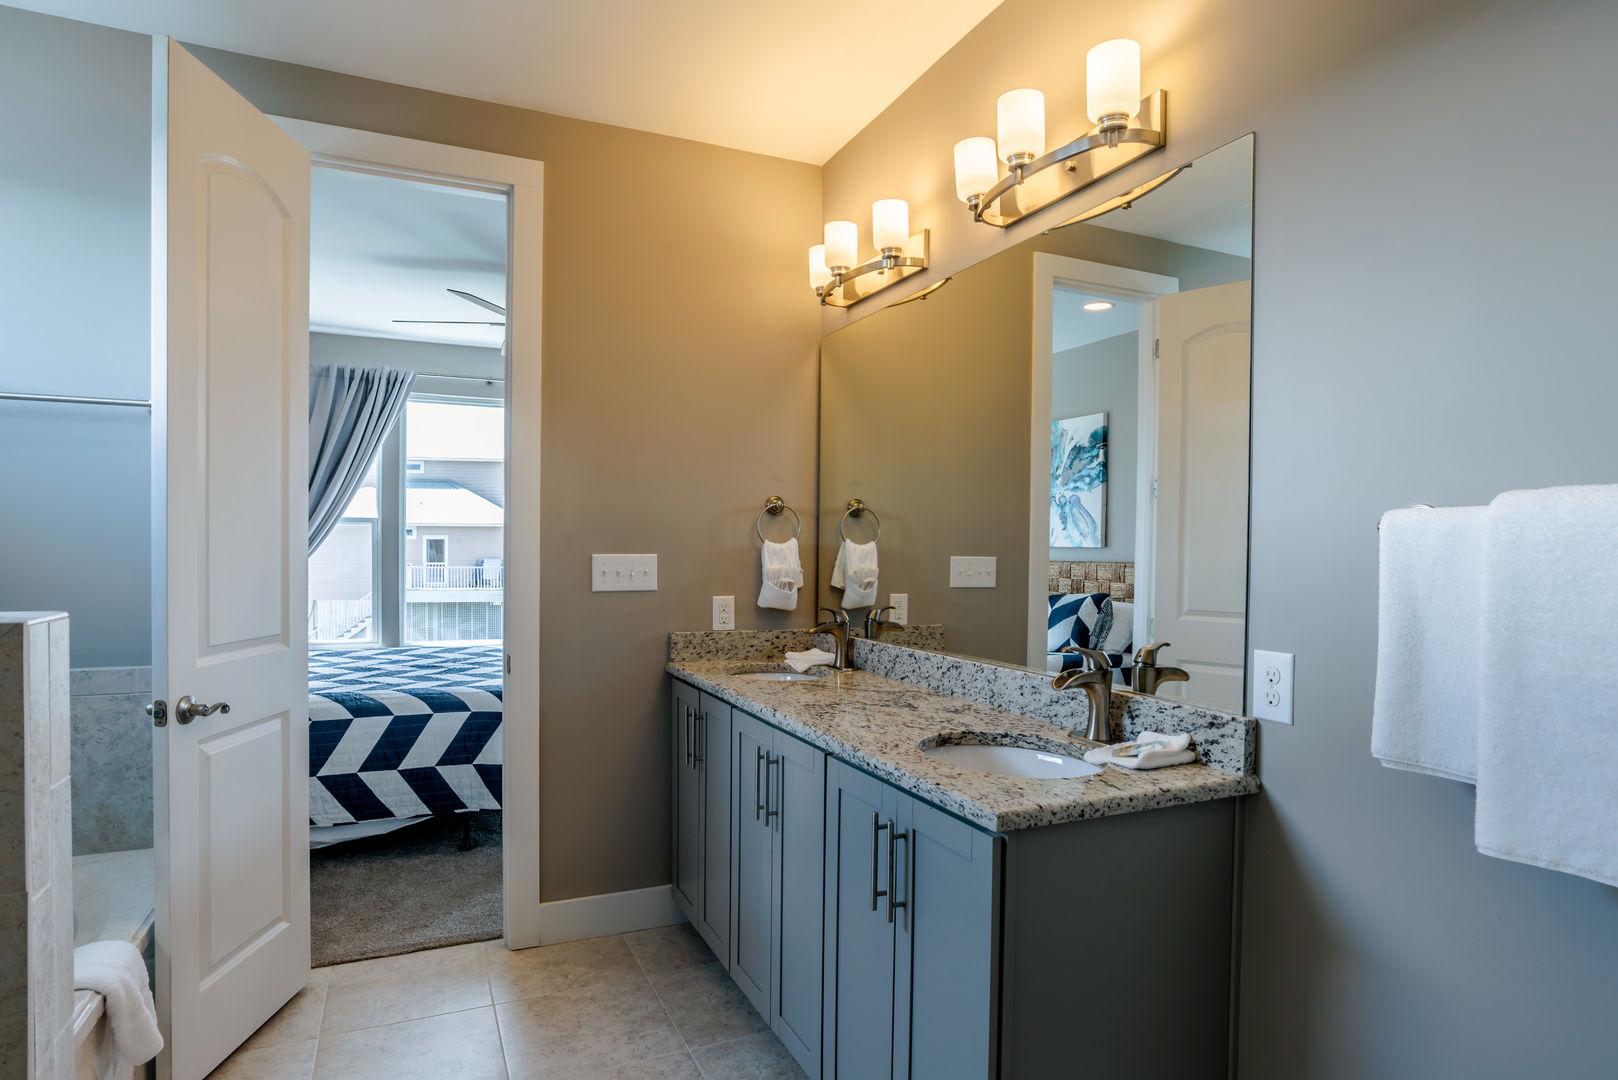 Master Bathroom in our Fort Morgan, Alabama Vacation Home Has Dual Vanities